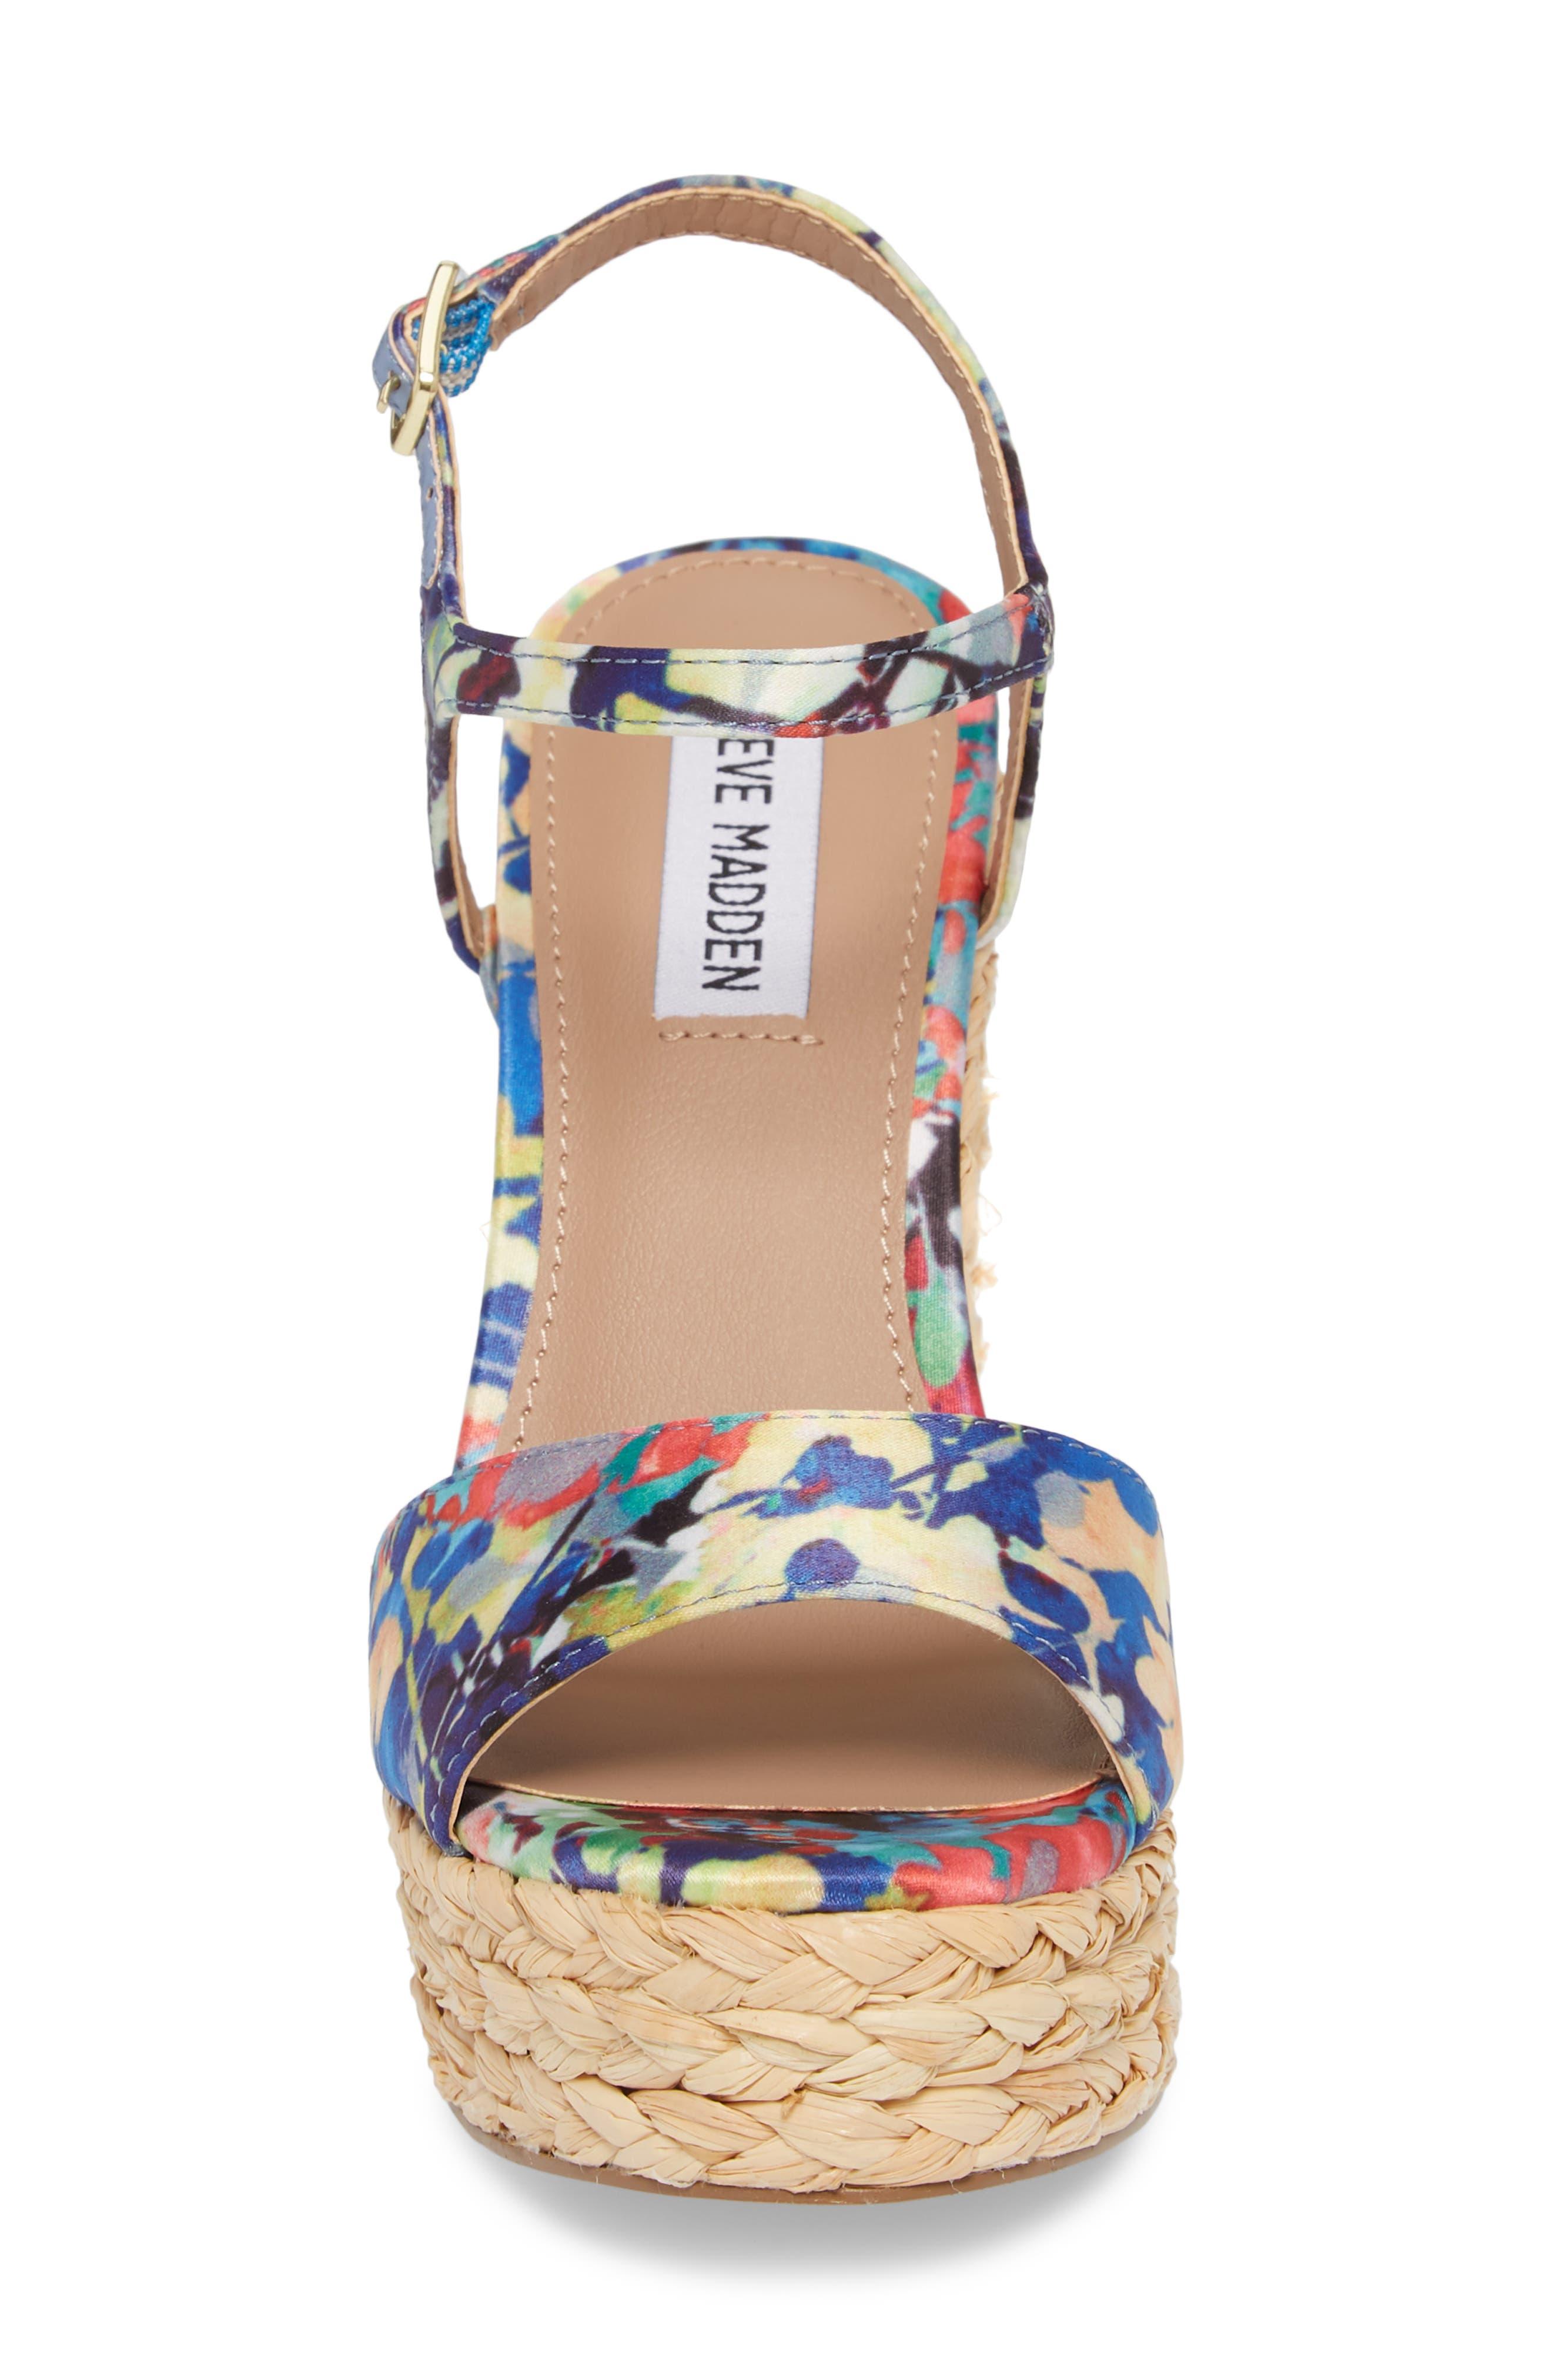 Tokin Espadrille Wedge Sandal,                             Alternate thumbnail 6, color,                             Floral Multi